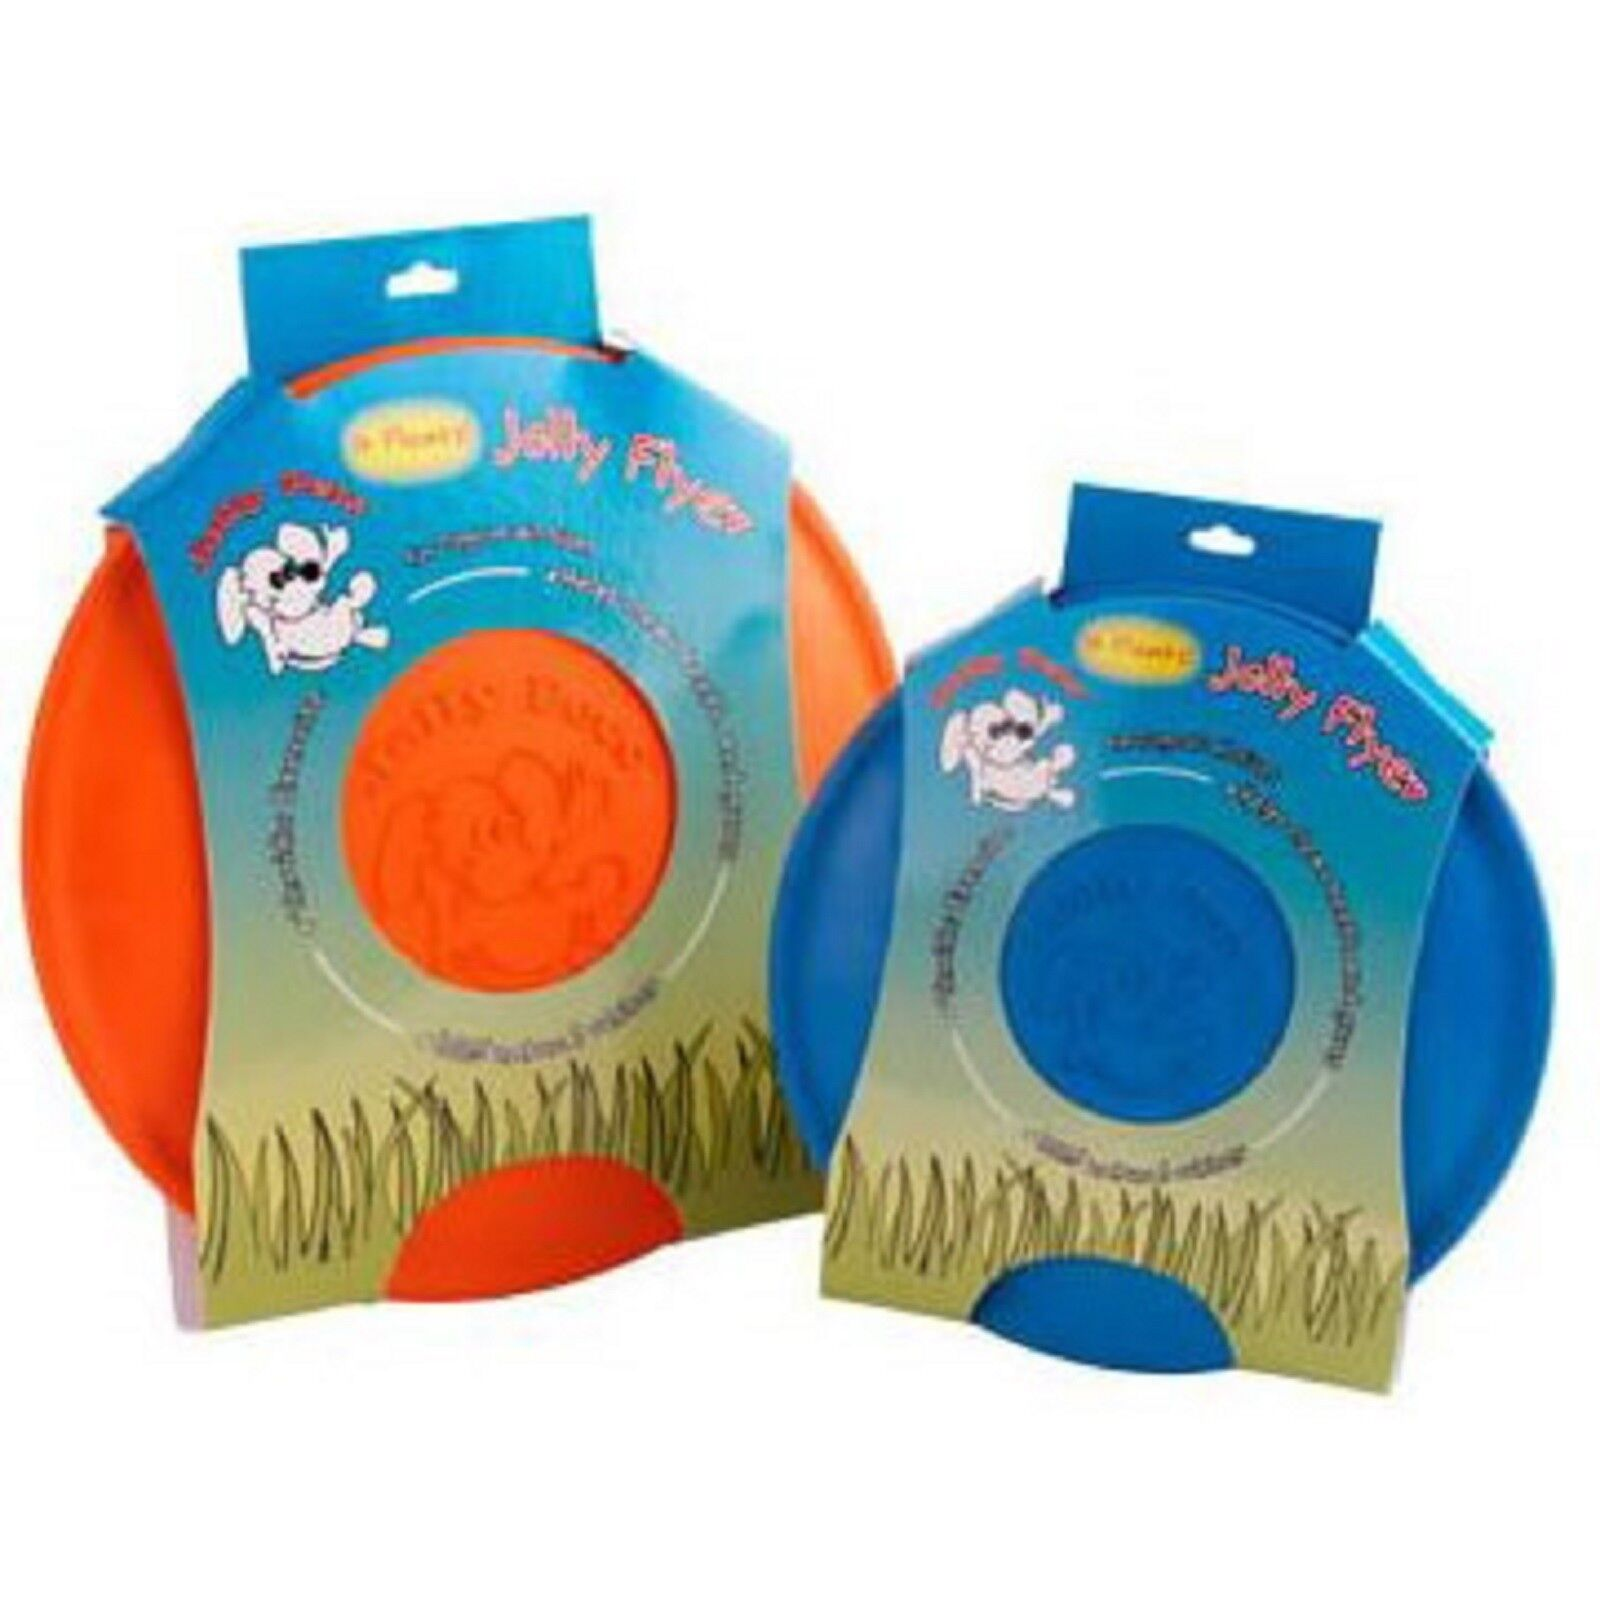 Jolly Pets Jolly Flyer 9.5 Blue Dog Toy